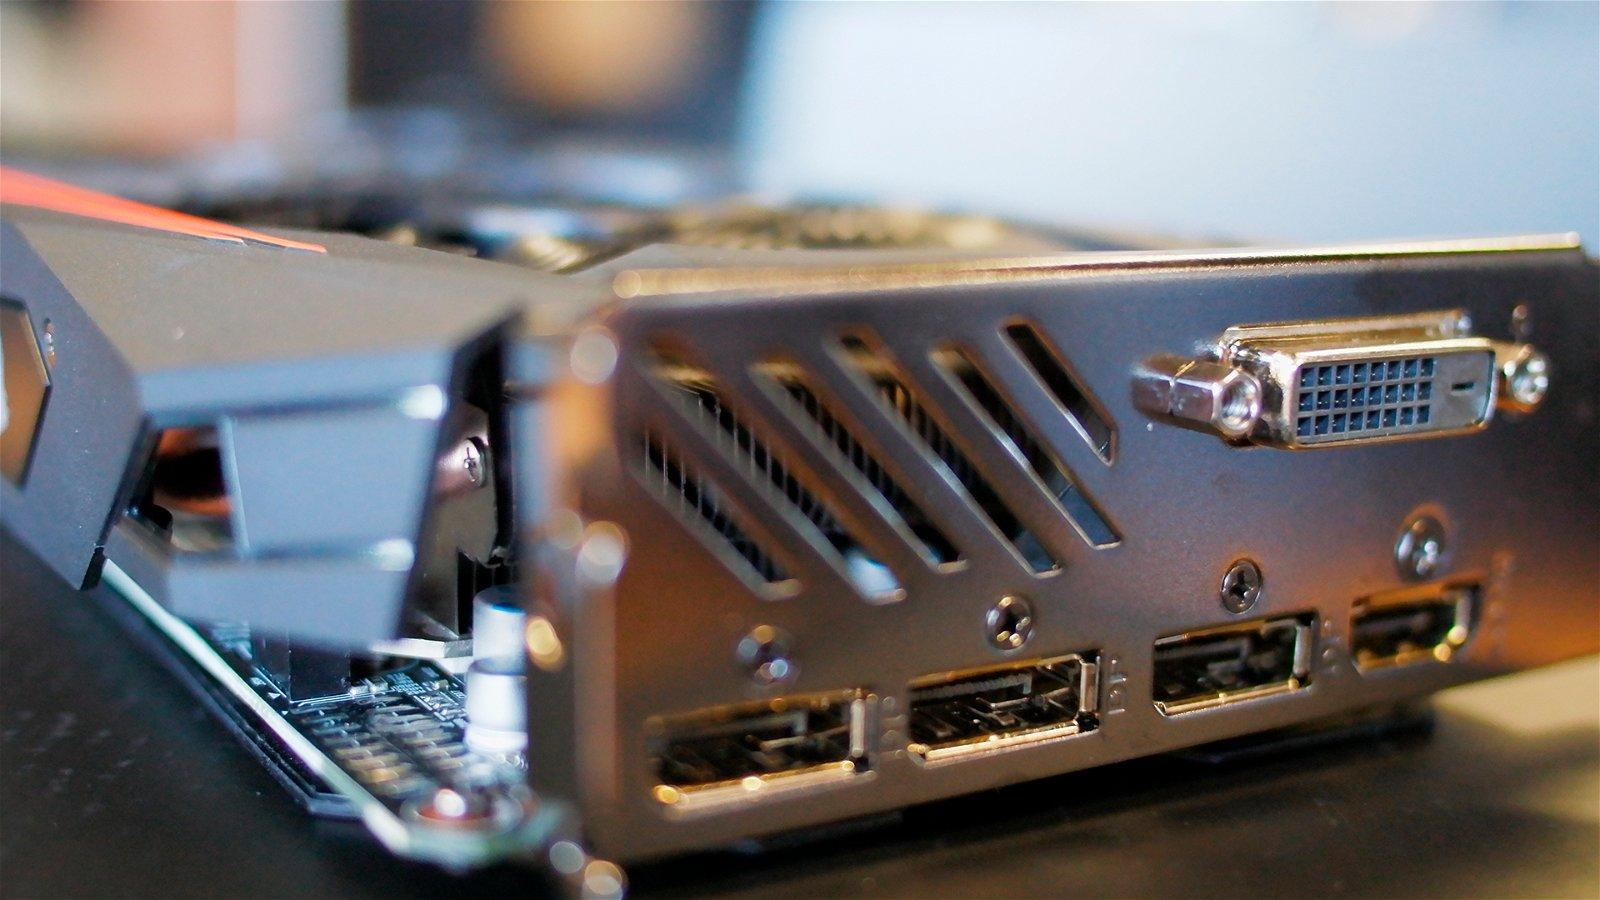 AMD Radeon RX 570 GPU (Hardware) Review – A Familiar Refresh 2